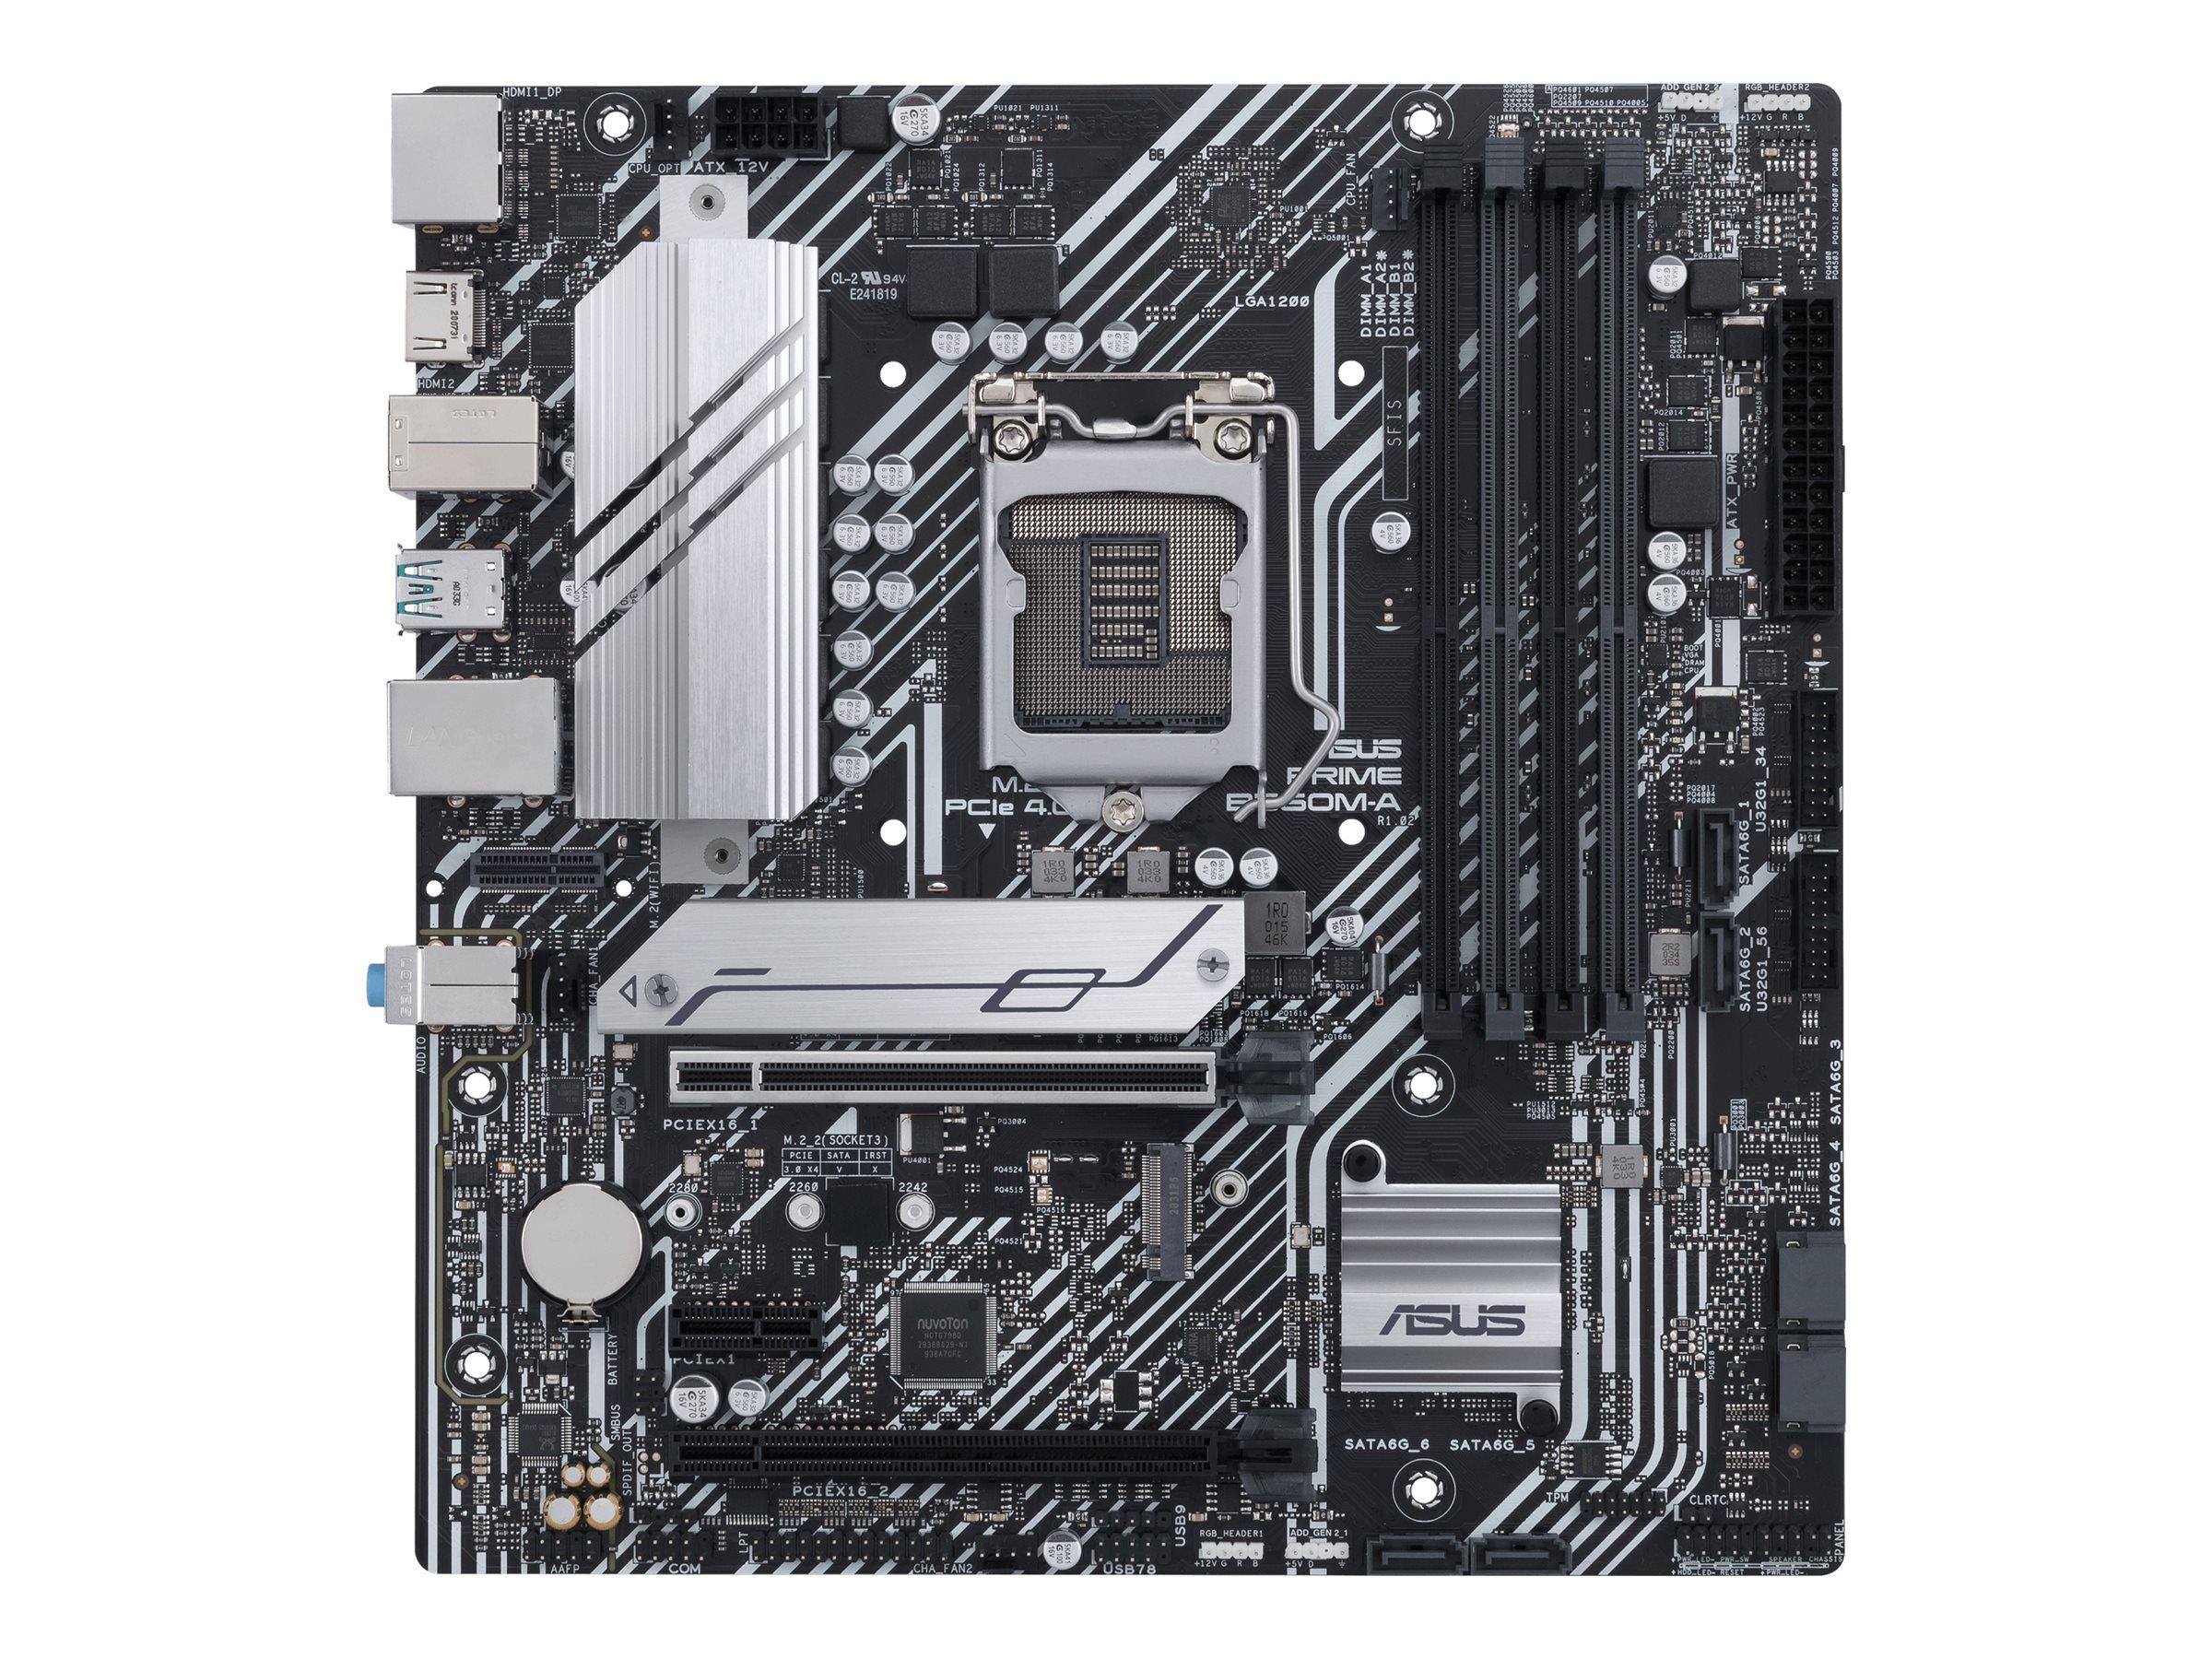 Vorschau: ASUS PRIME B560M-A - Motherboard - micro ATX - LGA1200-Sockel - B560 - USB-C Gen2, USB 3.2 Gen 1, USB 3.2 Gen 2 - Gigabit LAN - Onboard-Grafik (CPU erforderlich)